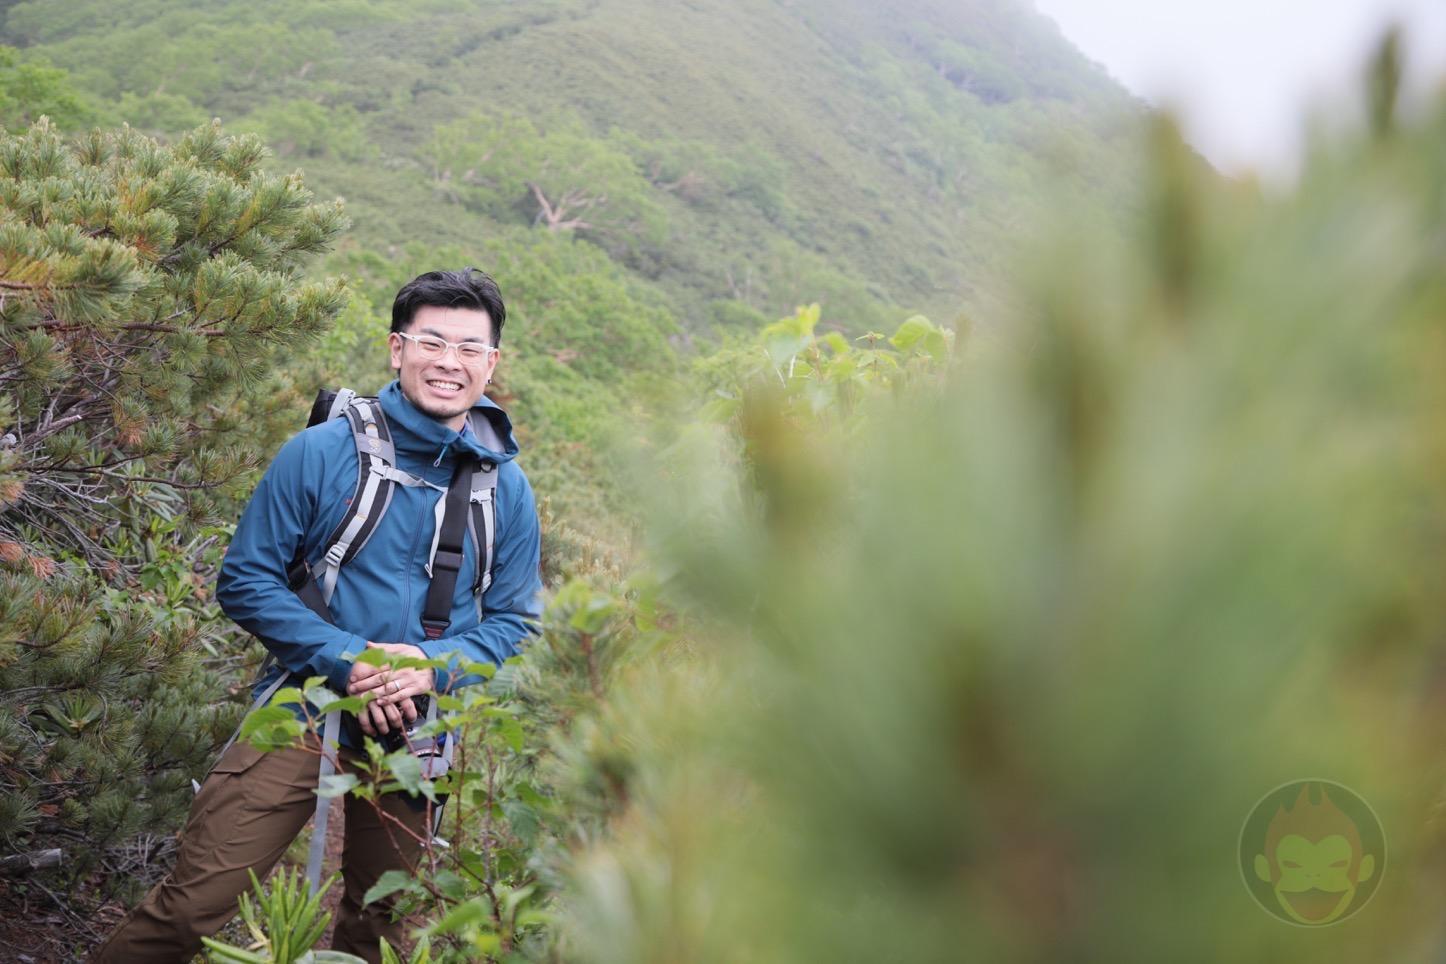 乗鞍新登山道整備2017:笑顔の僕